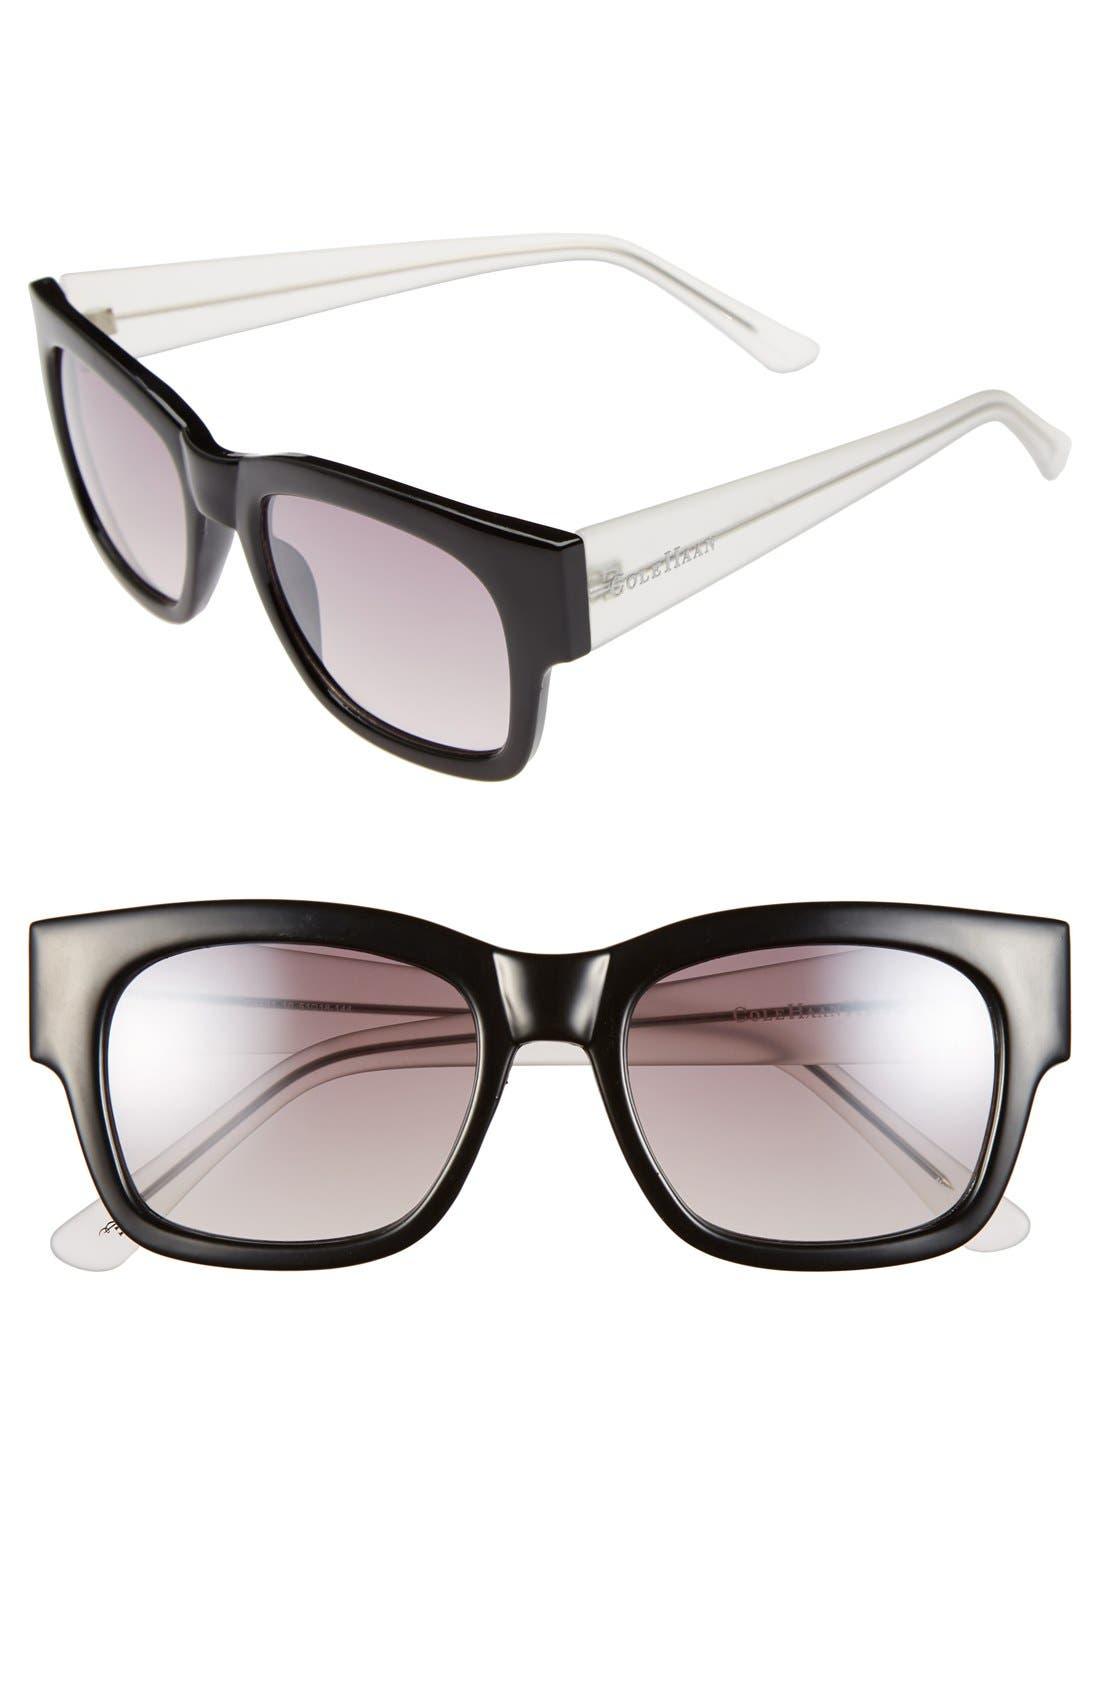 Main Image - Cole Haan 51mm Rectangular Sunglasses